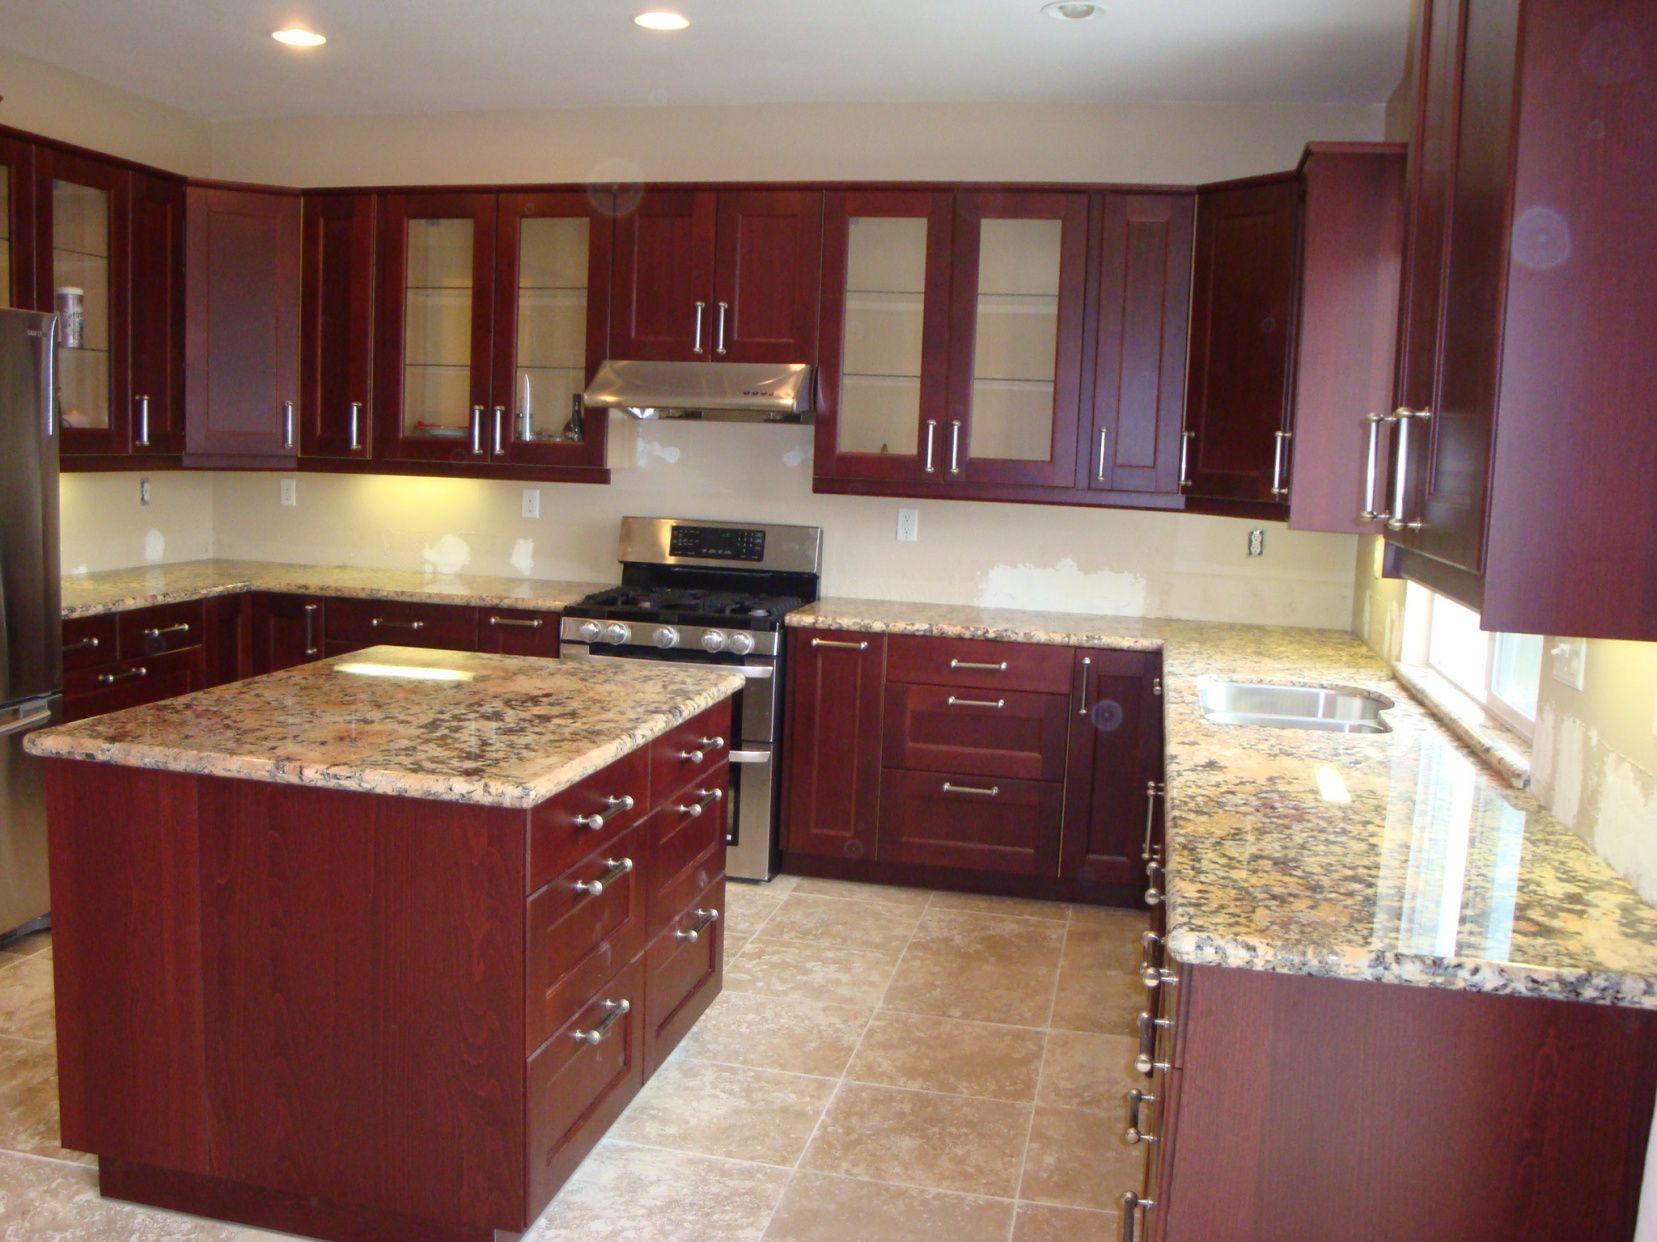 99 Granite Countertops with Cherry Cabinets Kitchen Decor theme